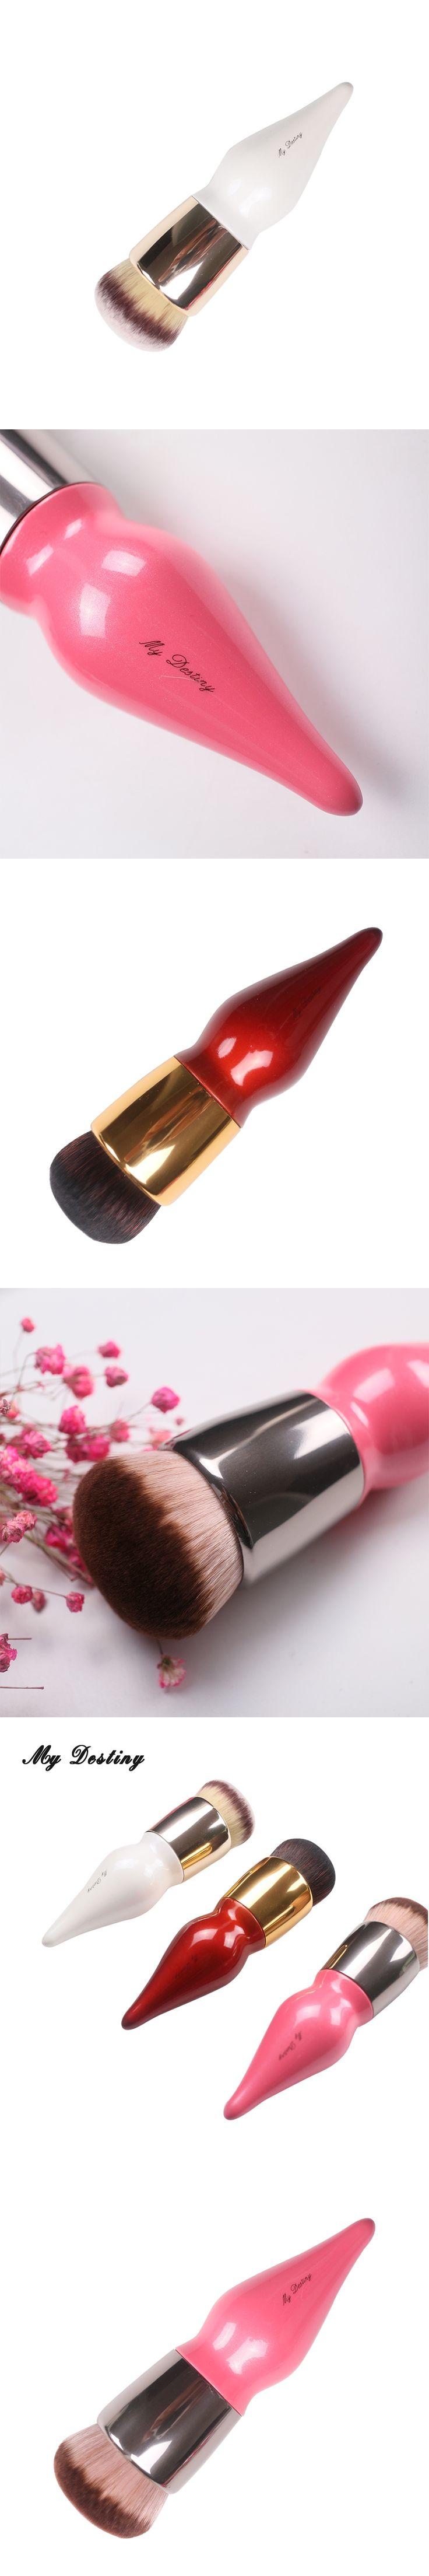 MY DESTINY Foundation Brush Gourd-shaped Kabuki Make Up Makeup Brushes Base Pincel Maquiagem Brochas Maquillaje Make Up Kwasten